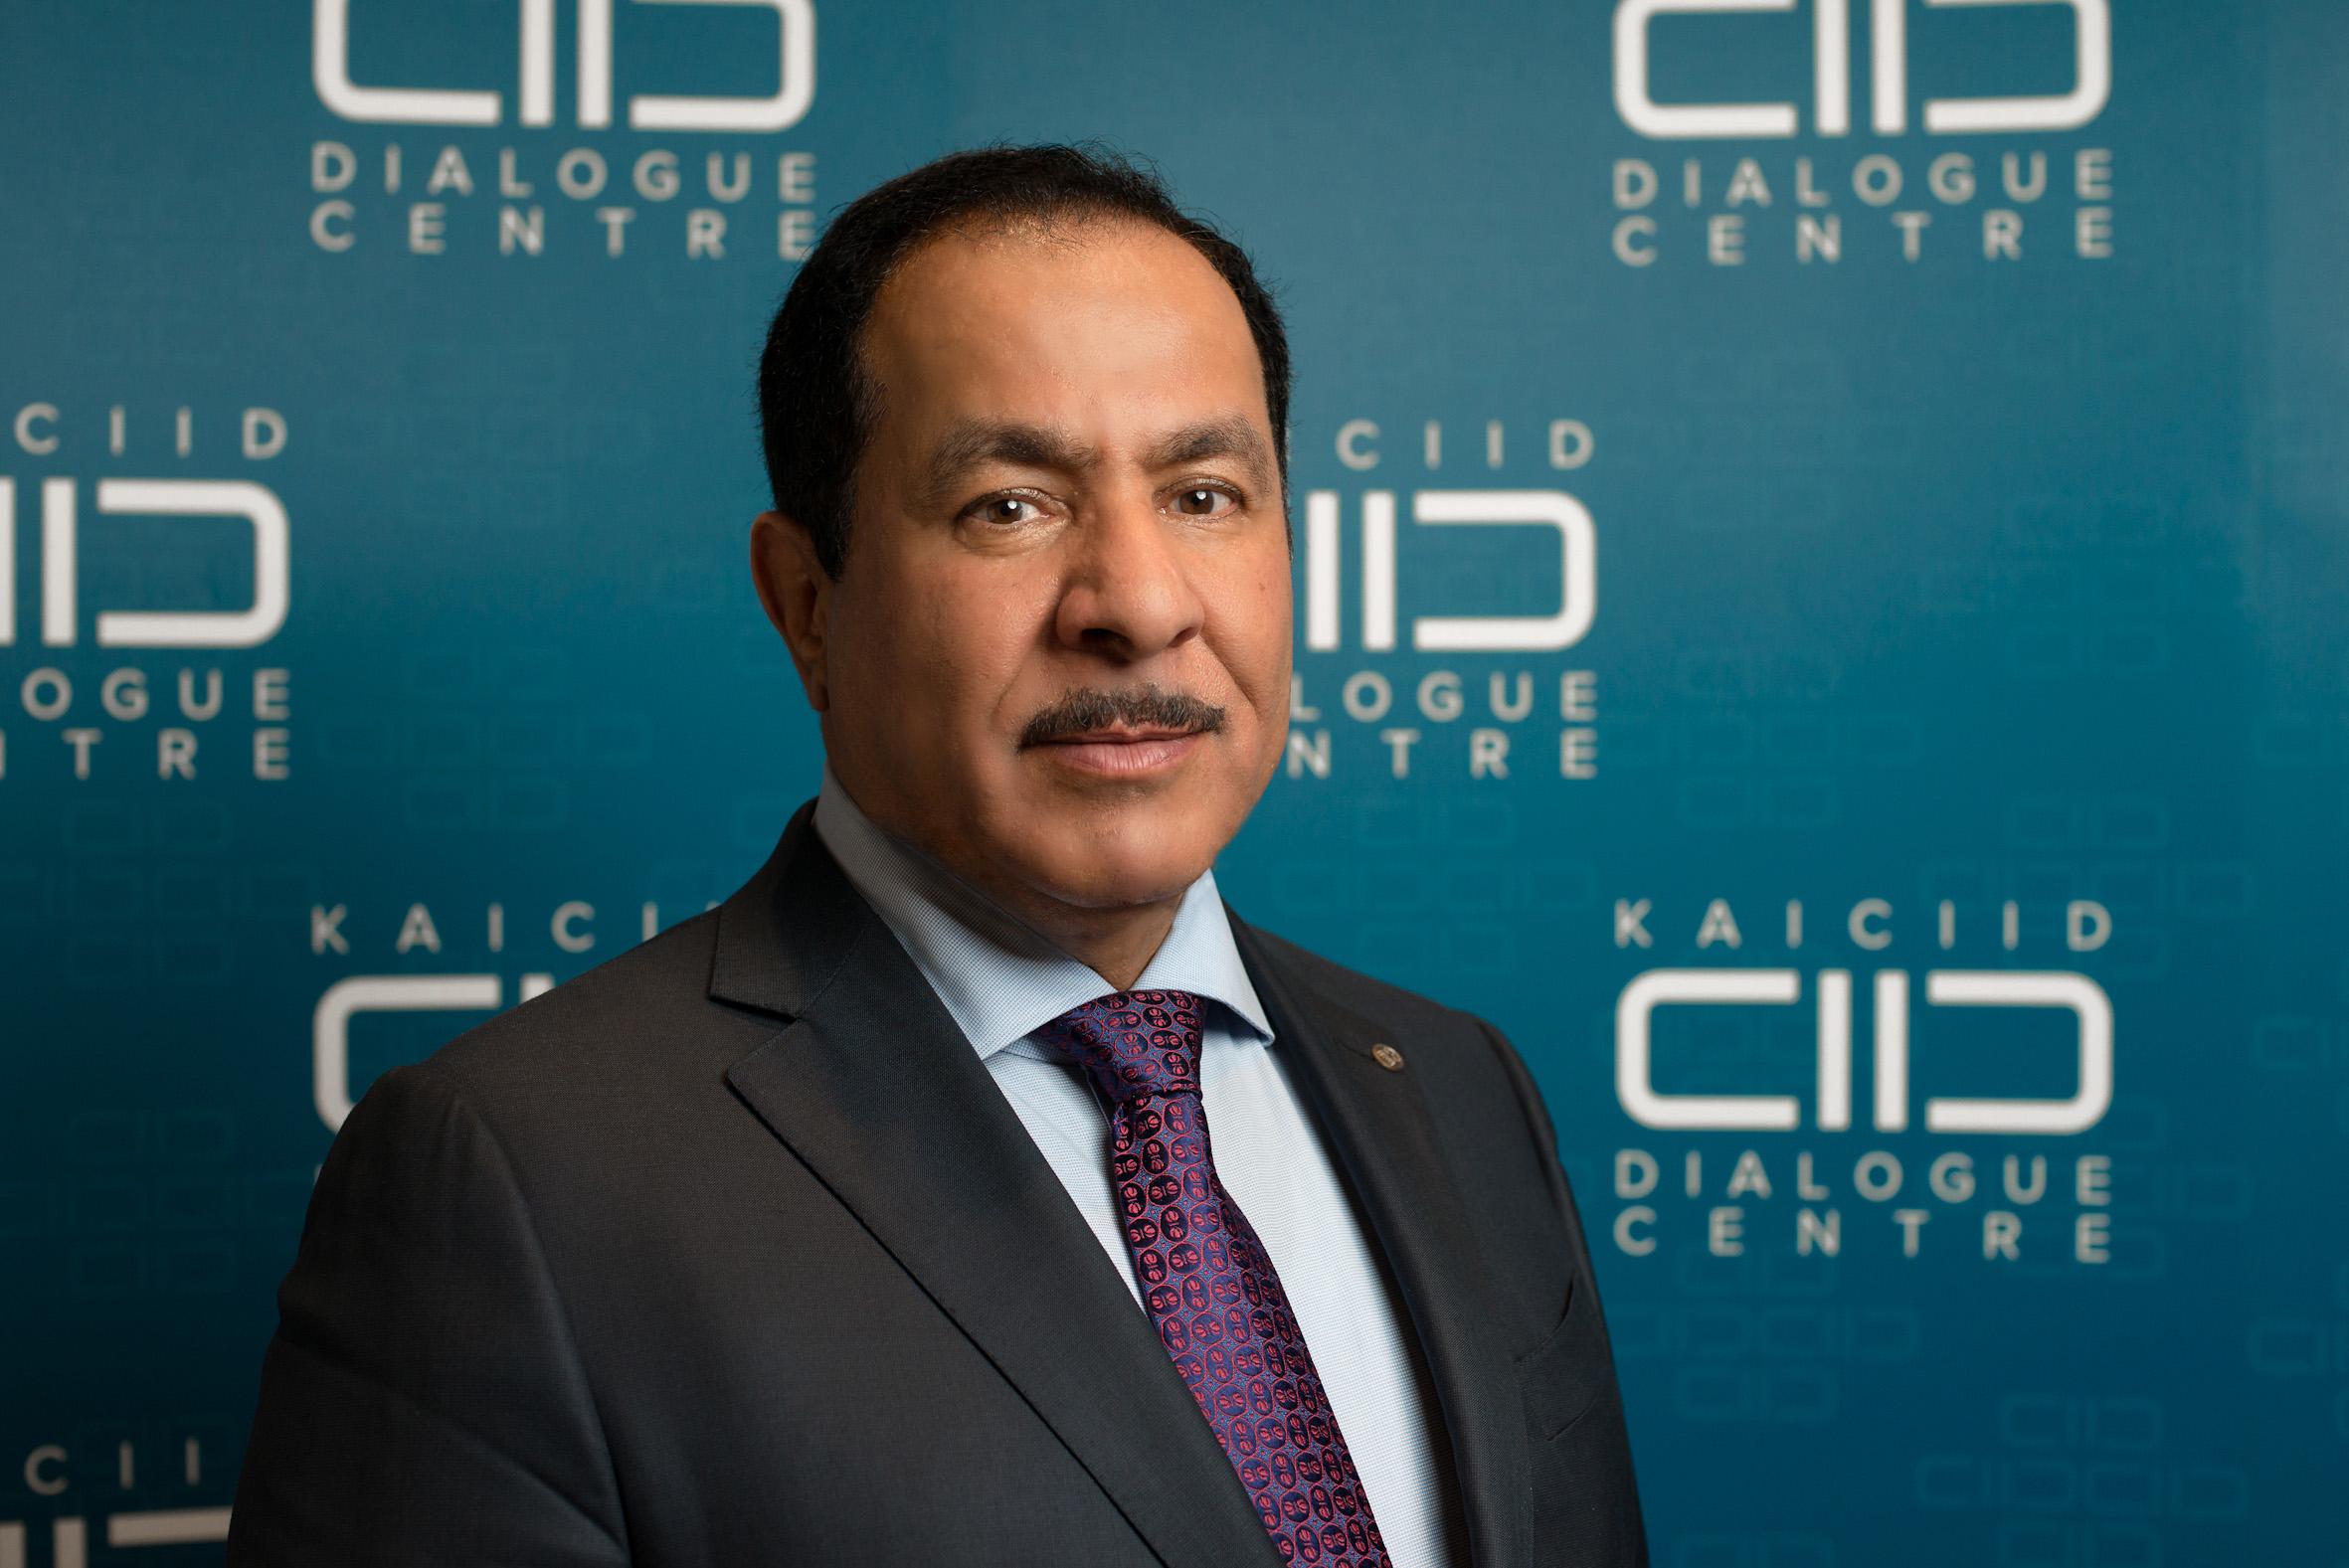 KAICIID Secretary General